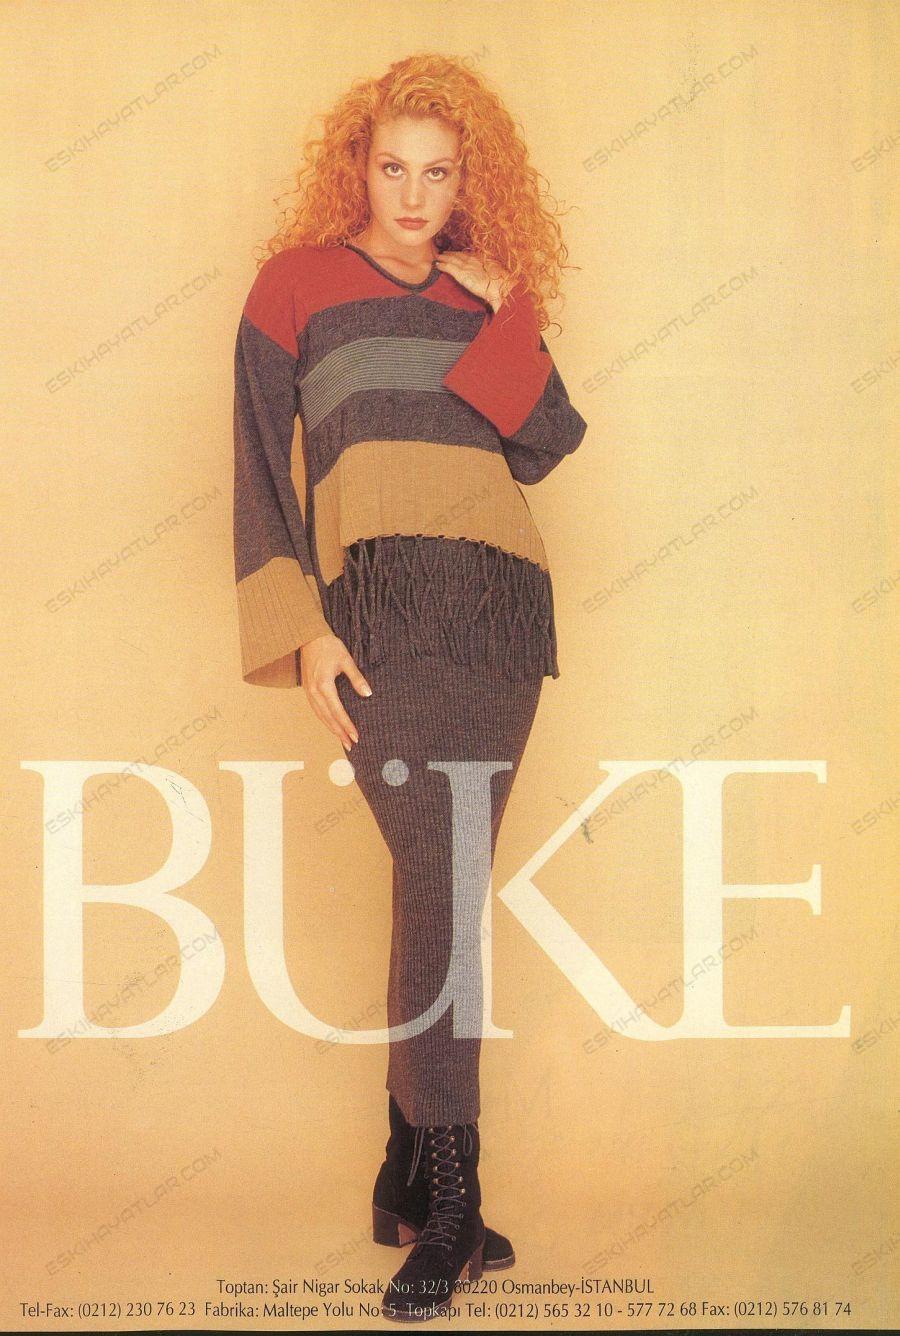 0364-buke-giyim-markasi-1994-osmanbey-tekstil-markalari